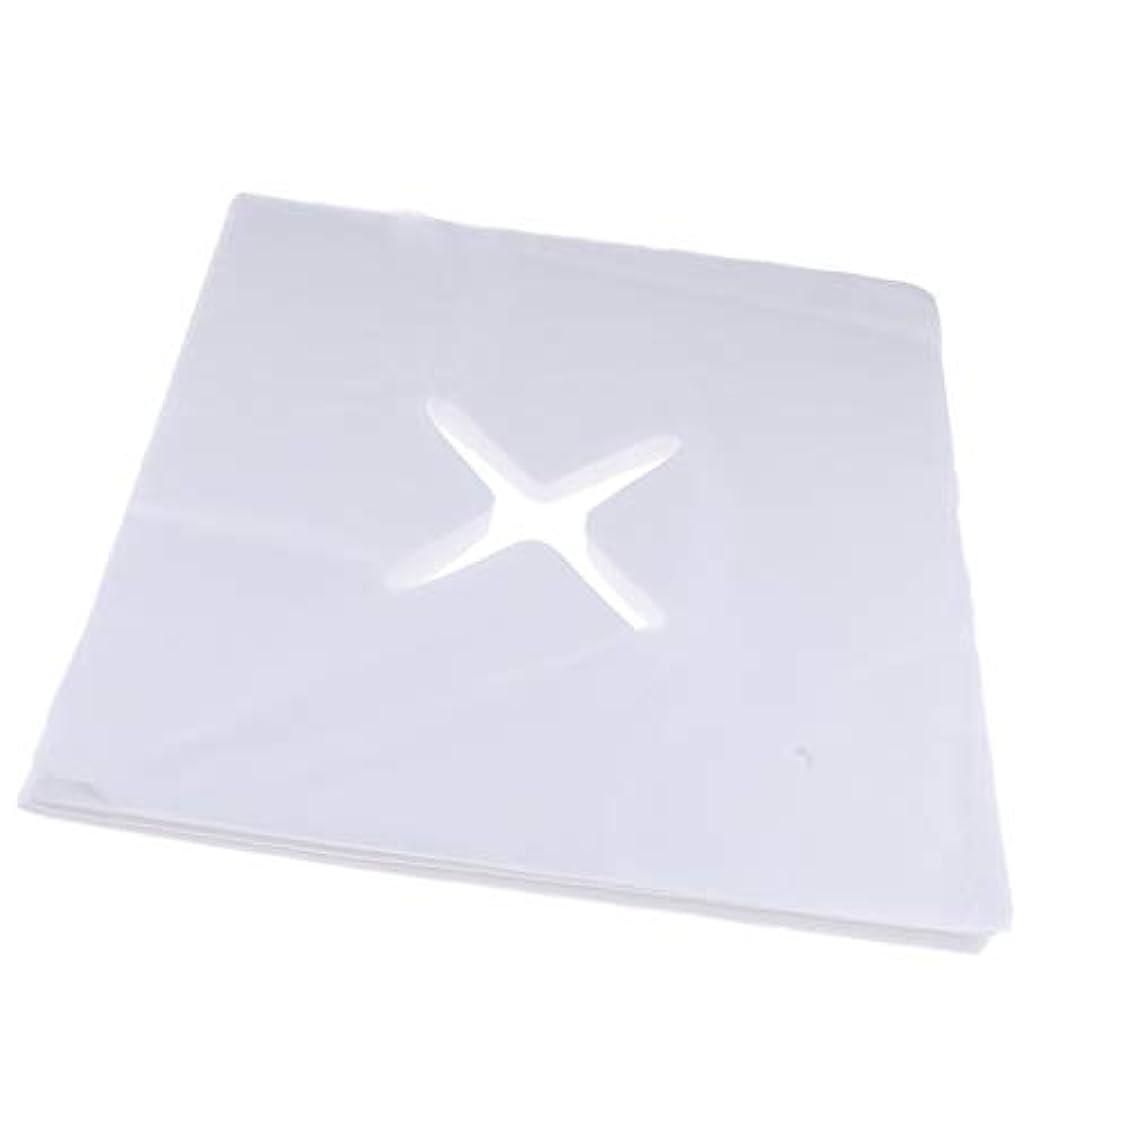 FLAMEER 約200枚 十字カット 使い捨て ピローシート フェイスカバー 枕カバー クッション S/M - L